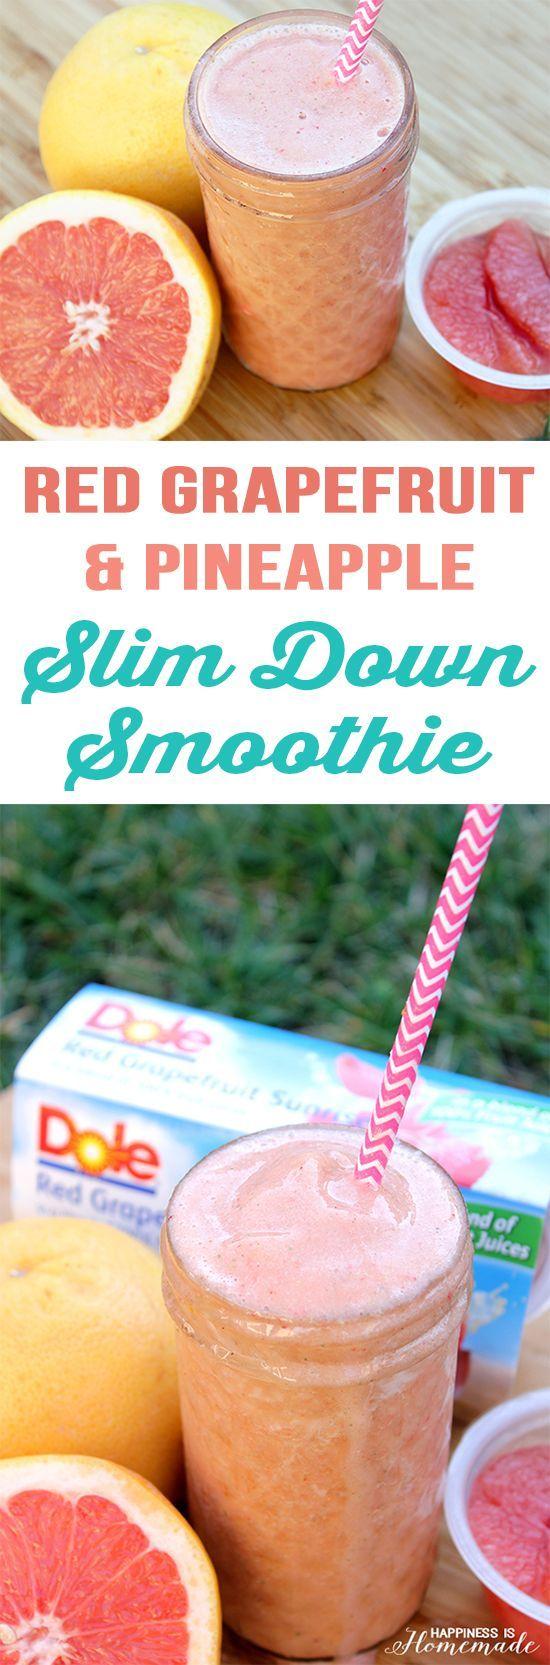 Red Grapefruit and Pineapple Slim Down Smoothie Recipe #GrapefruitBowl #ad